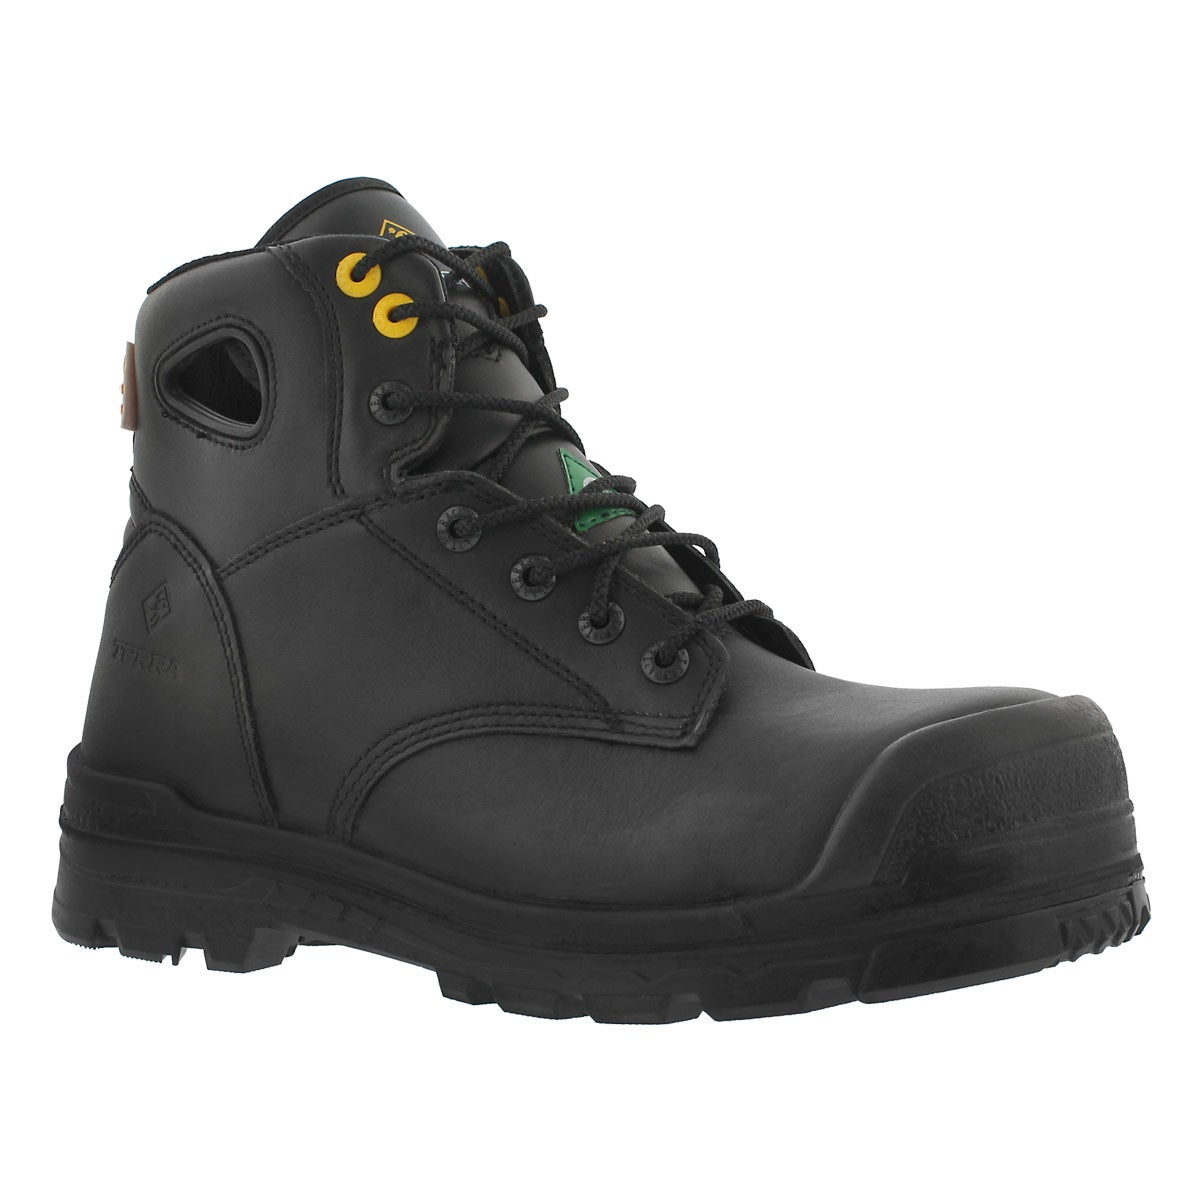 Terra Men S Baron Black Lace Up Csa Boots